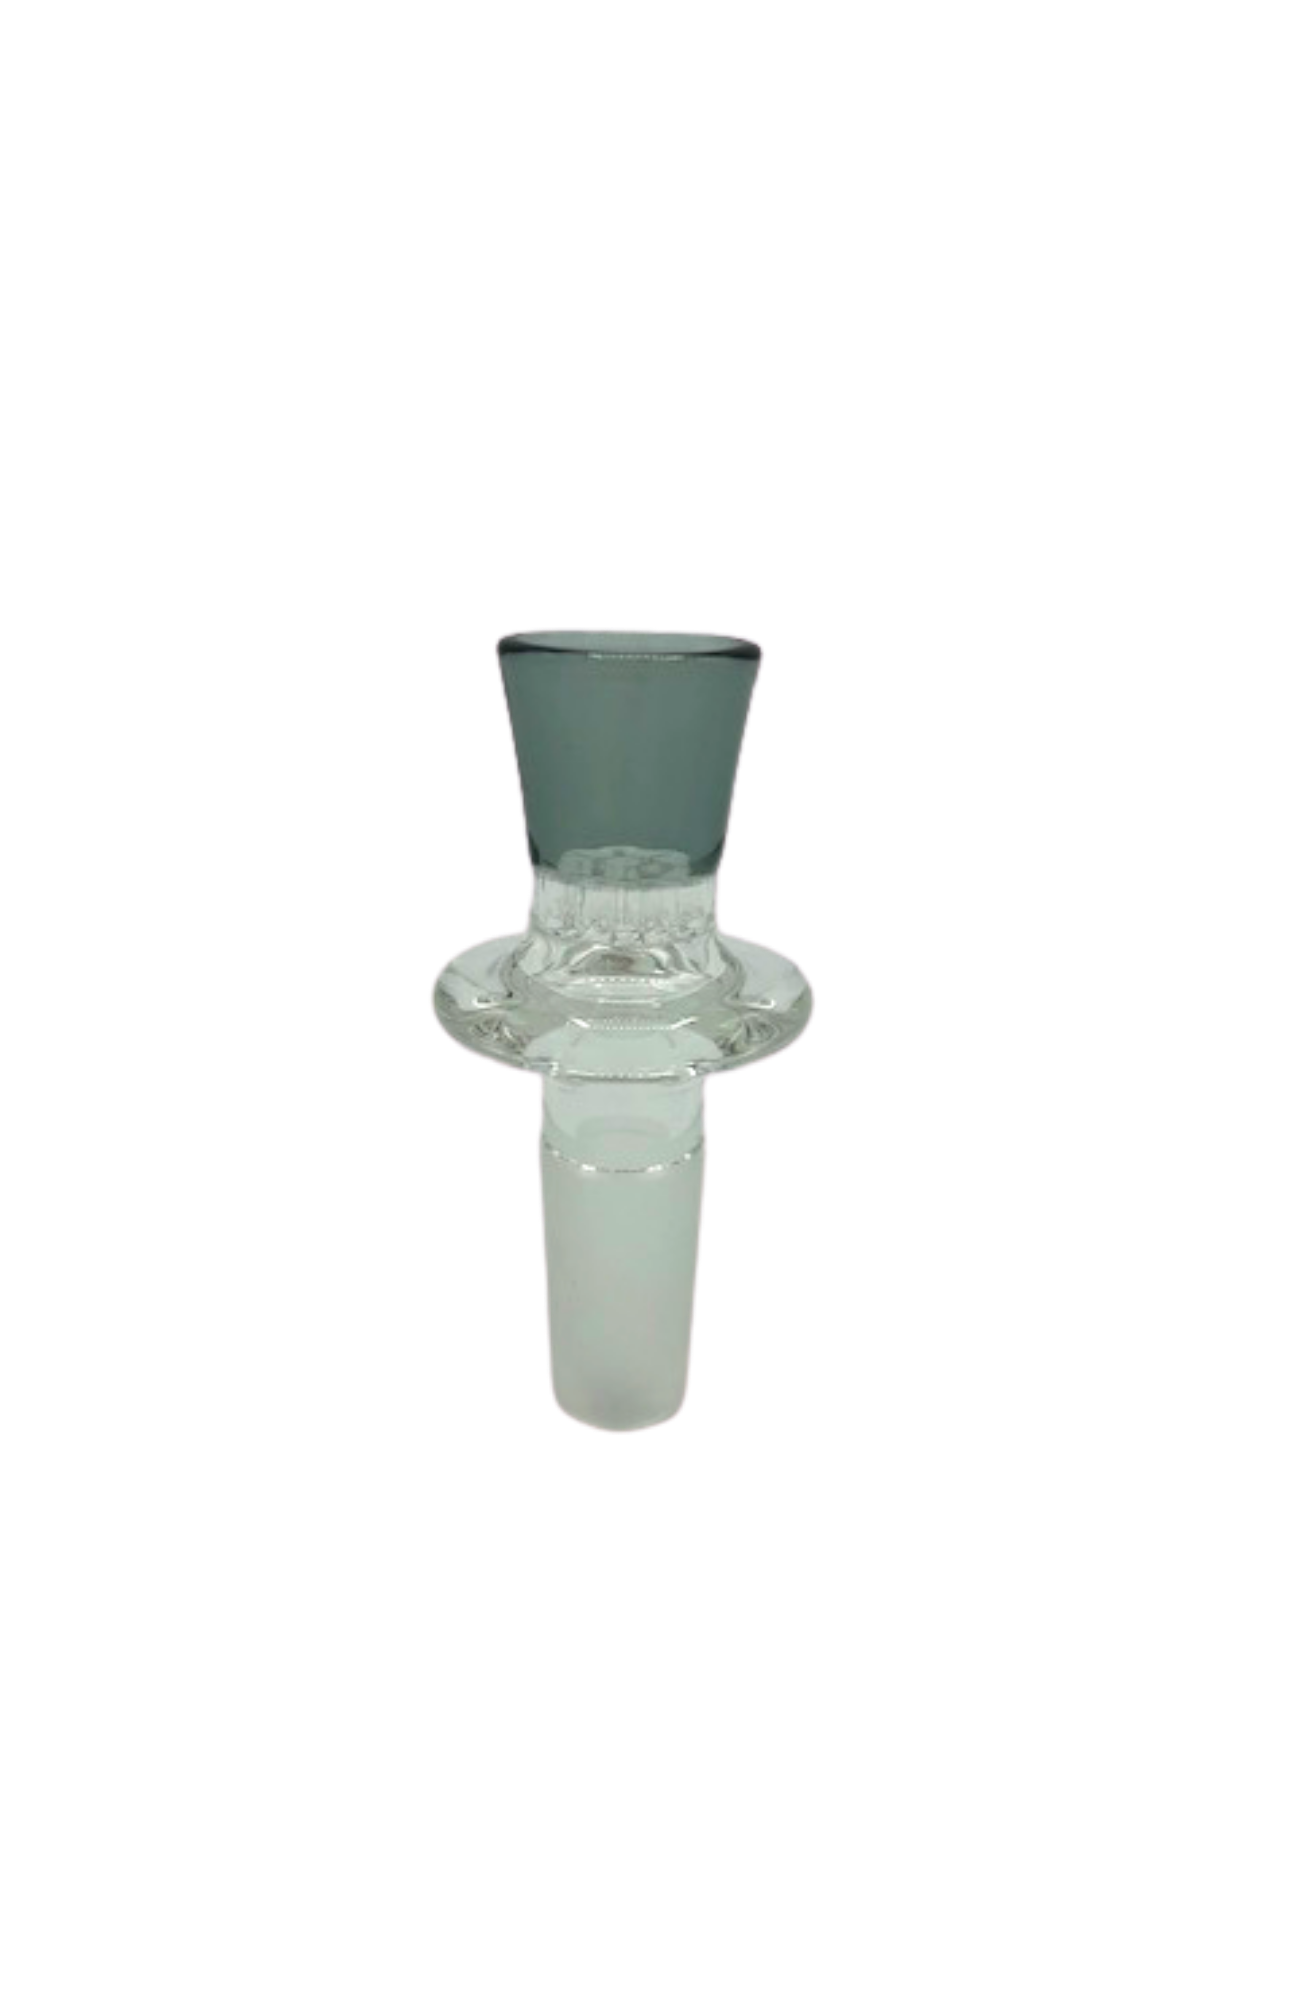 BBG Male 14mm Smoke Honeycomb Gong Slide